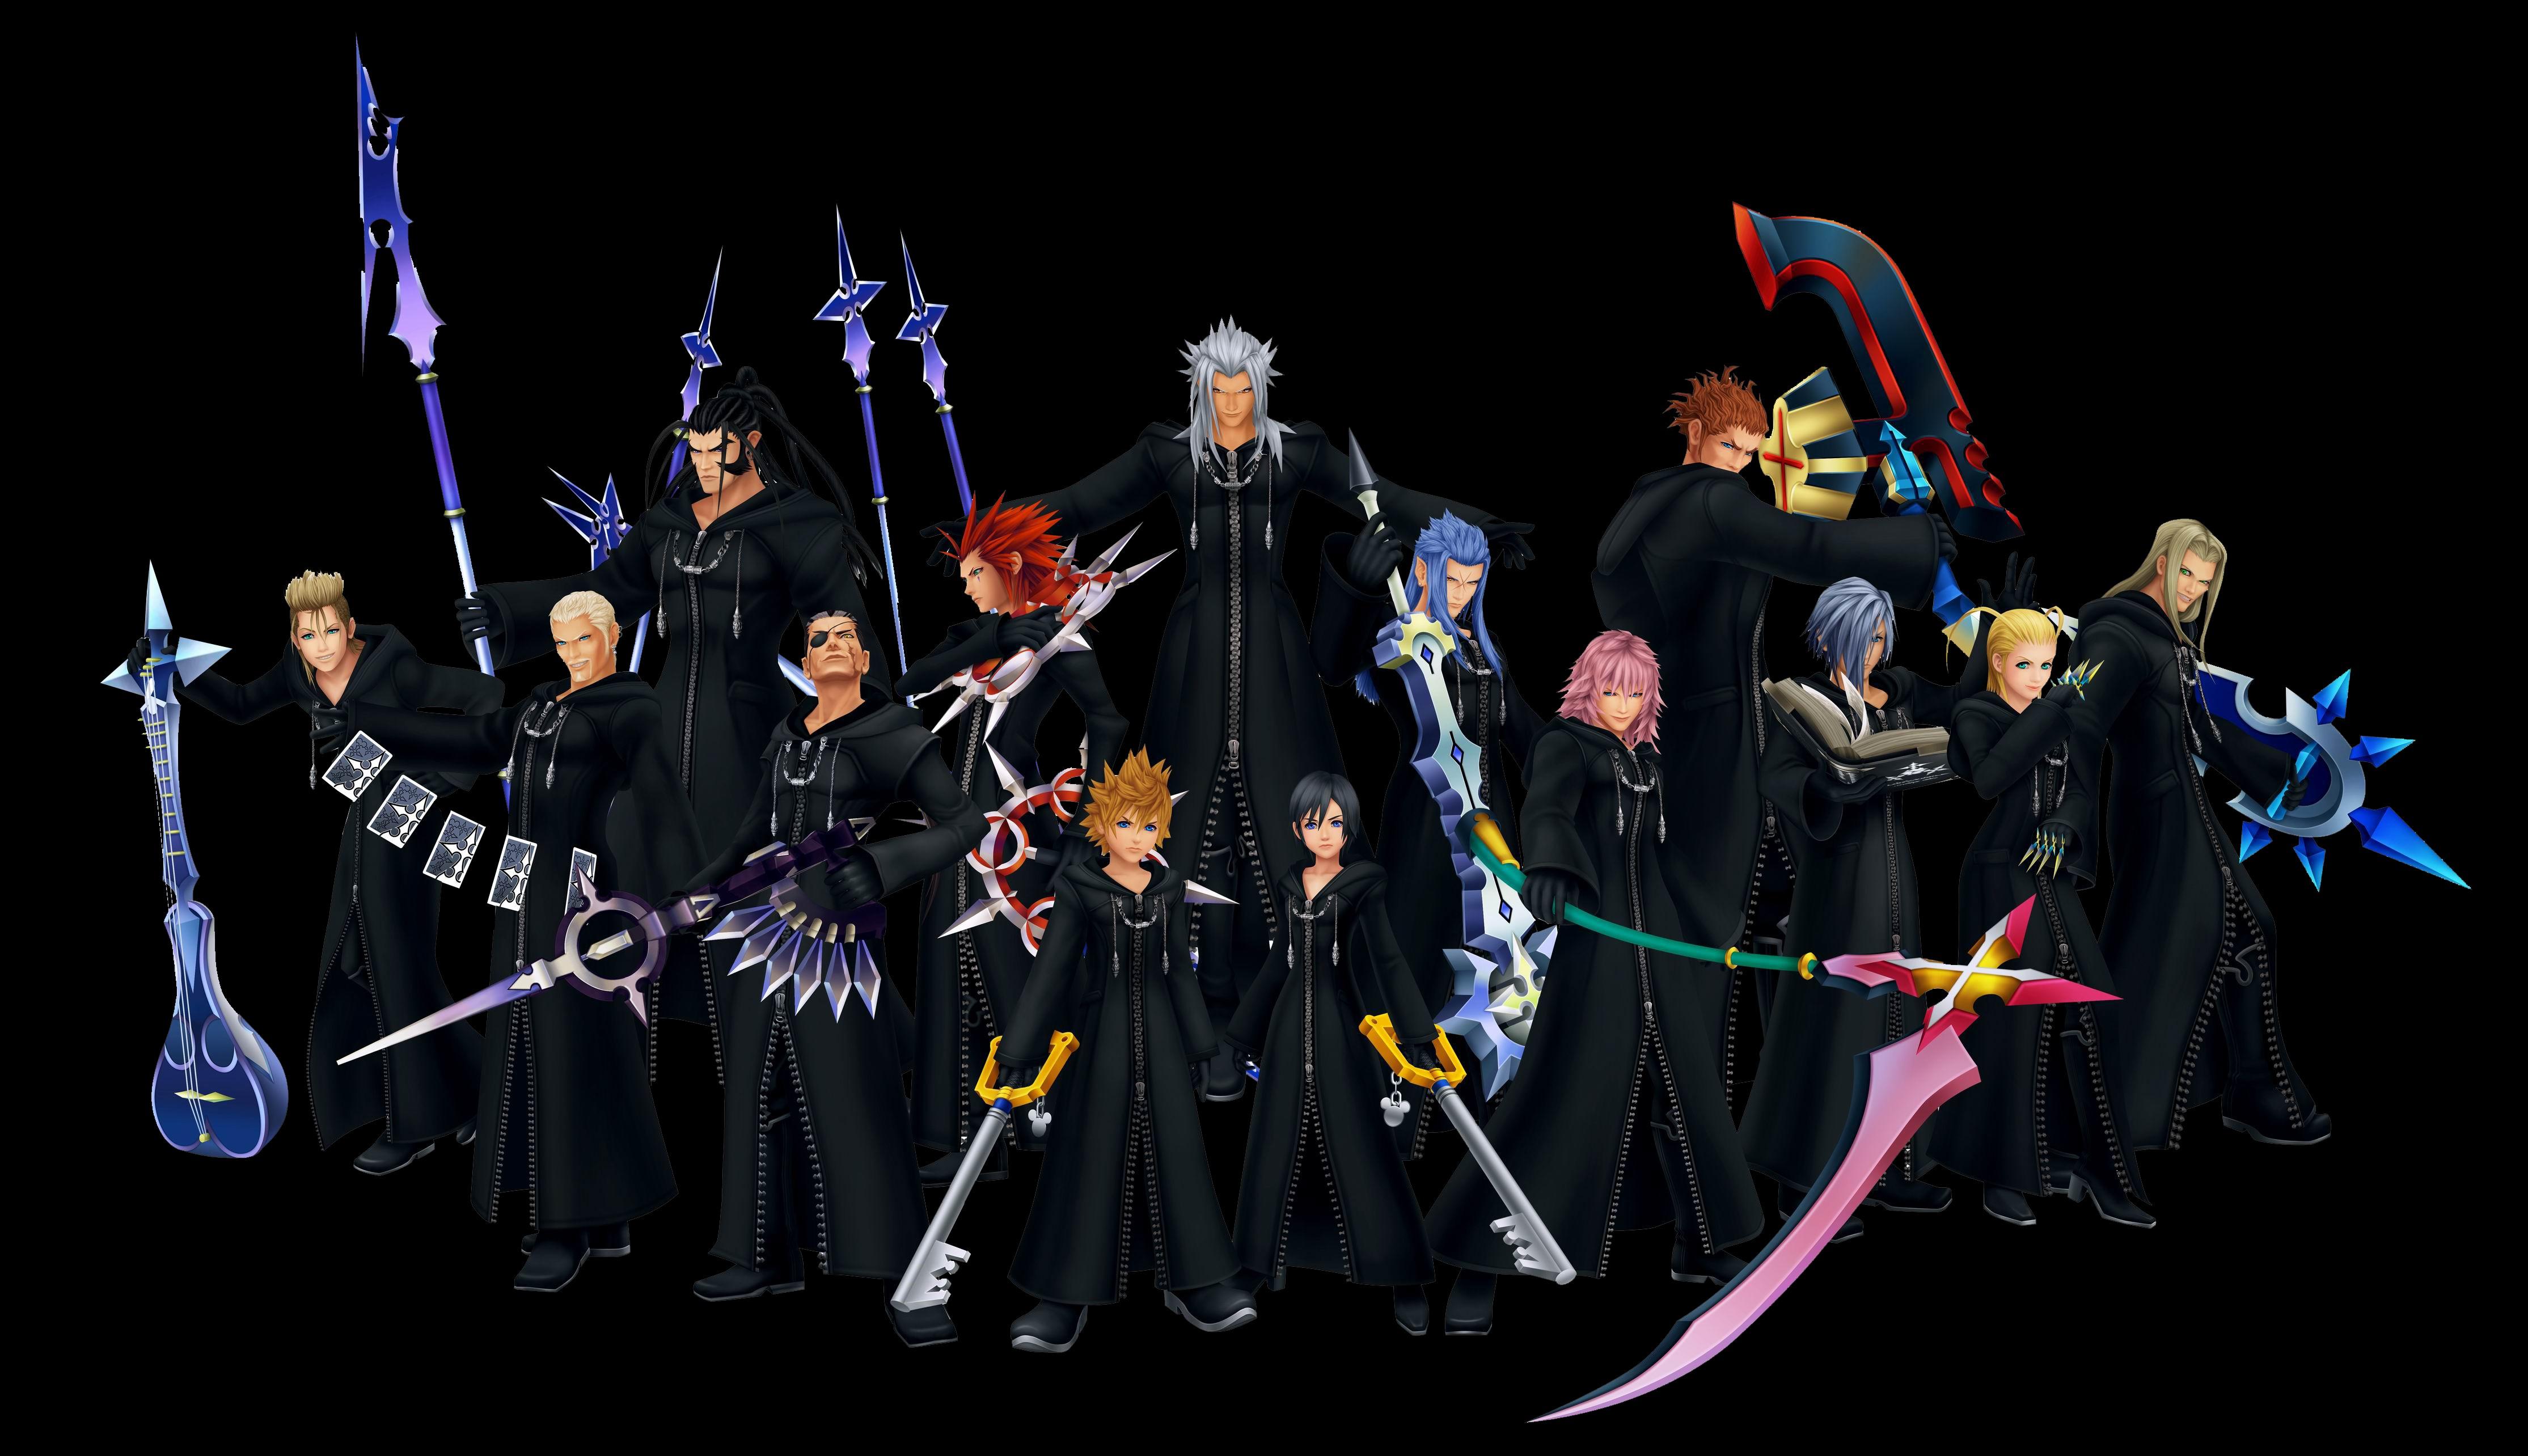 Kingdom Hearts disney multi dual wallpaper backgroundKingdom Hearts Organization 13 Wallpaper